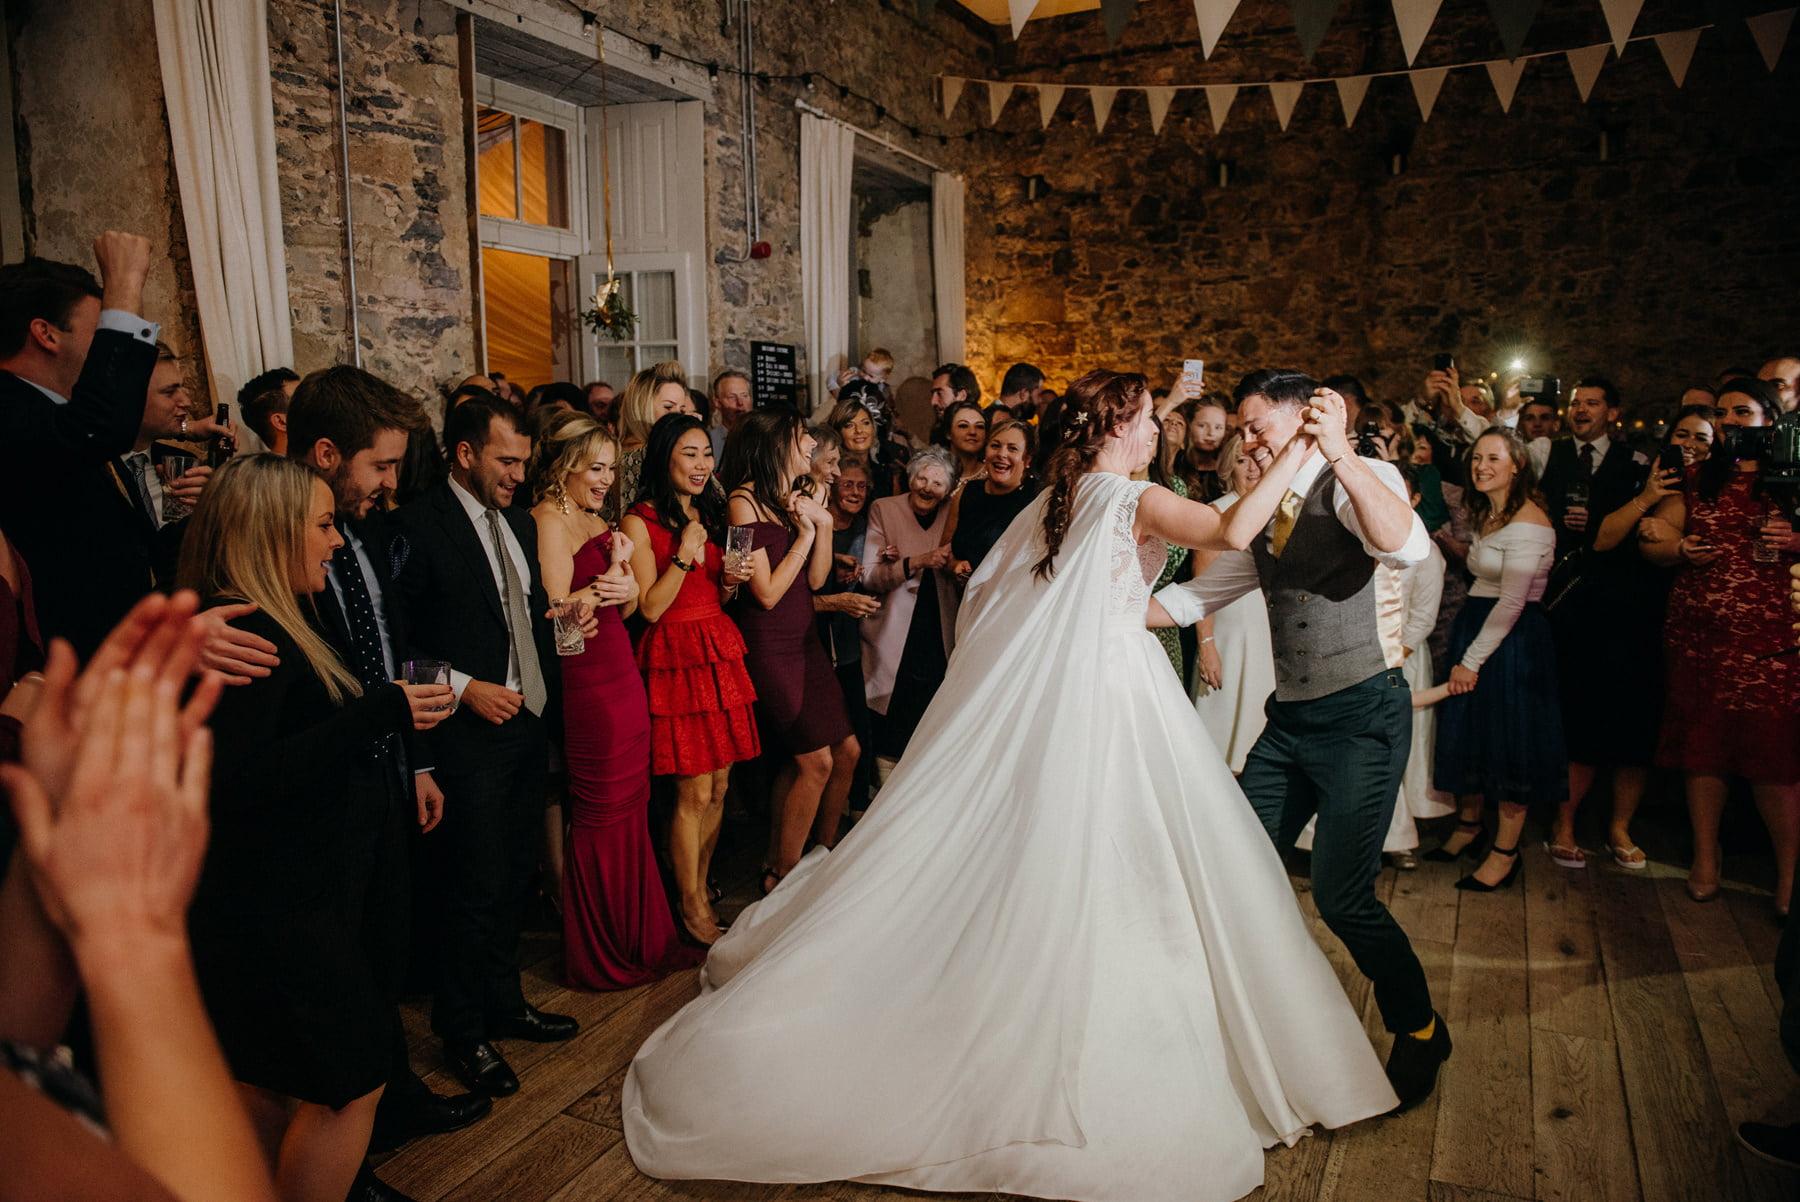 Cloughjordan House Winter Wedding dances at night